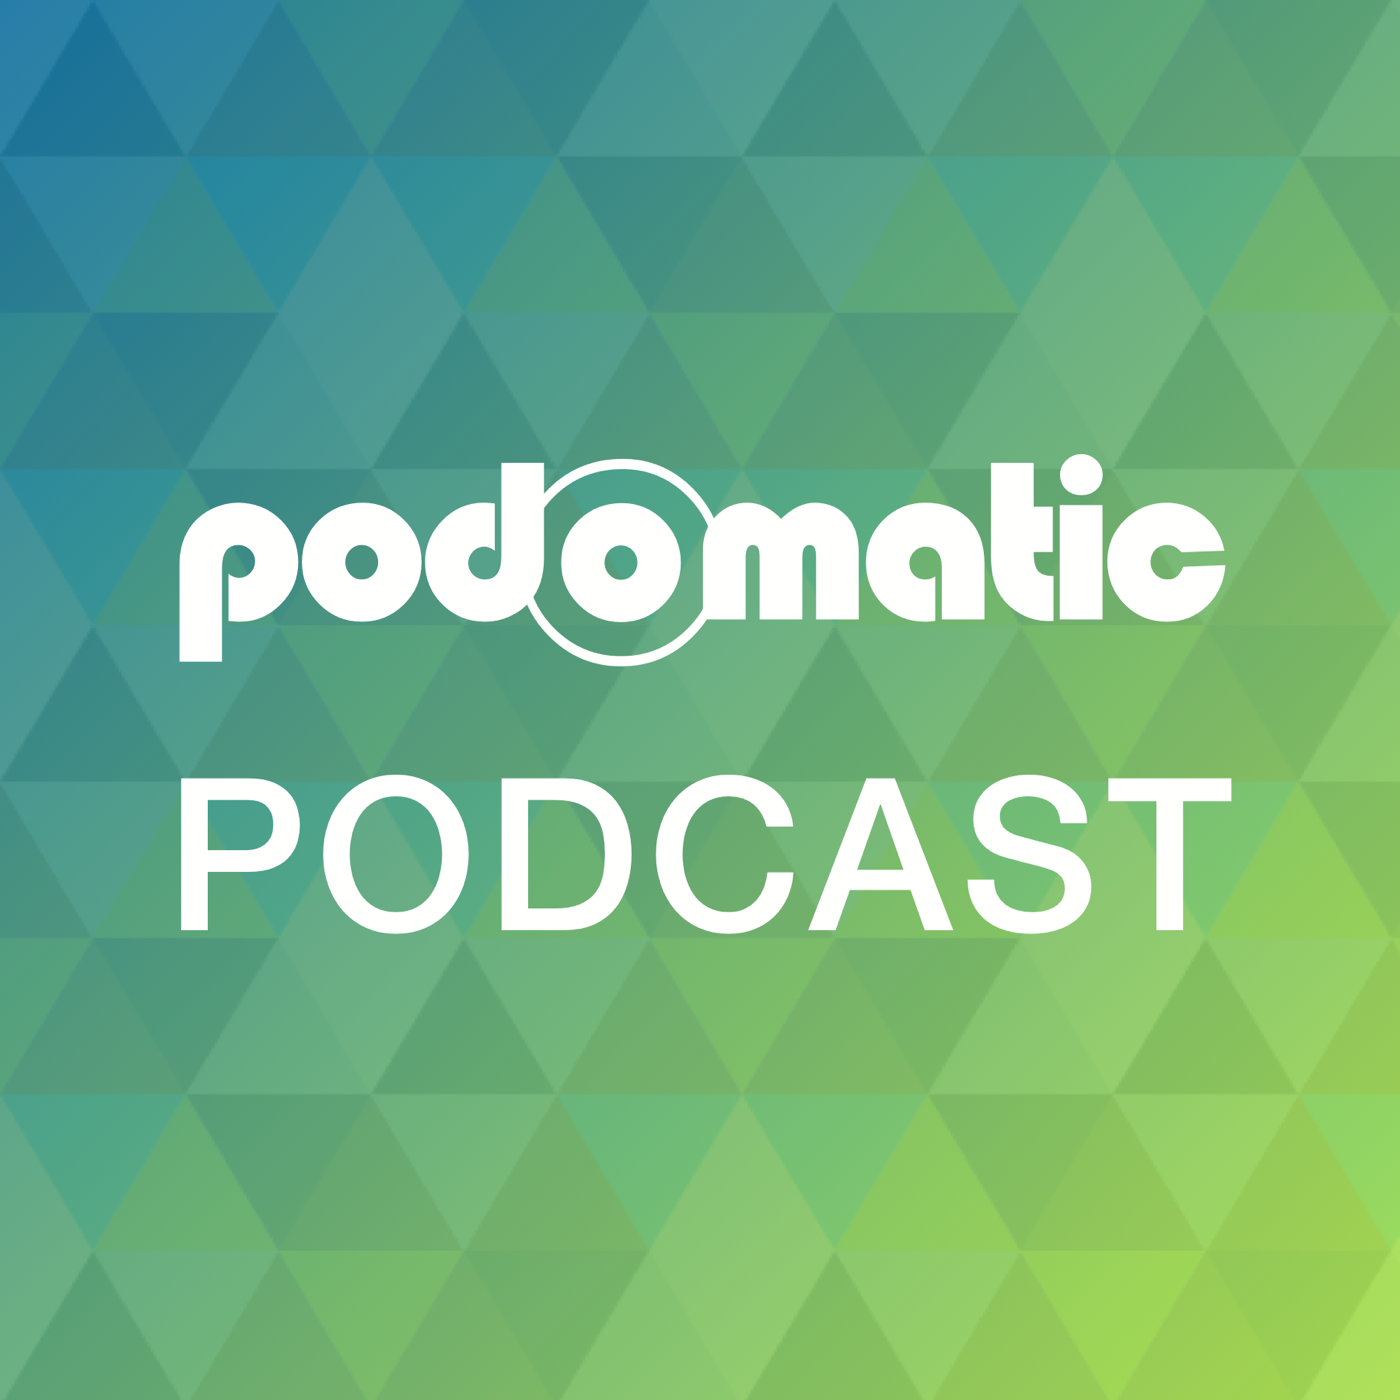 Brandon Sanders' Podcast